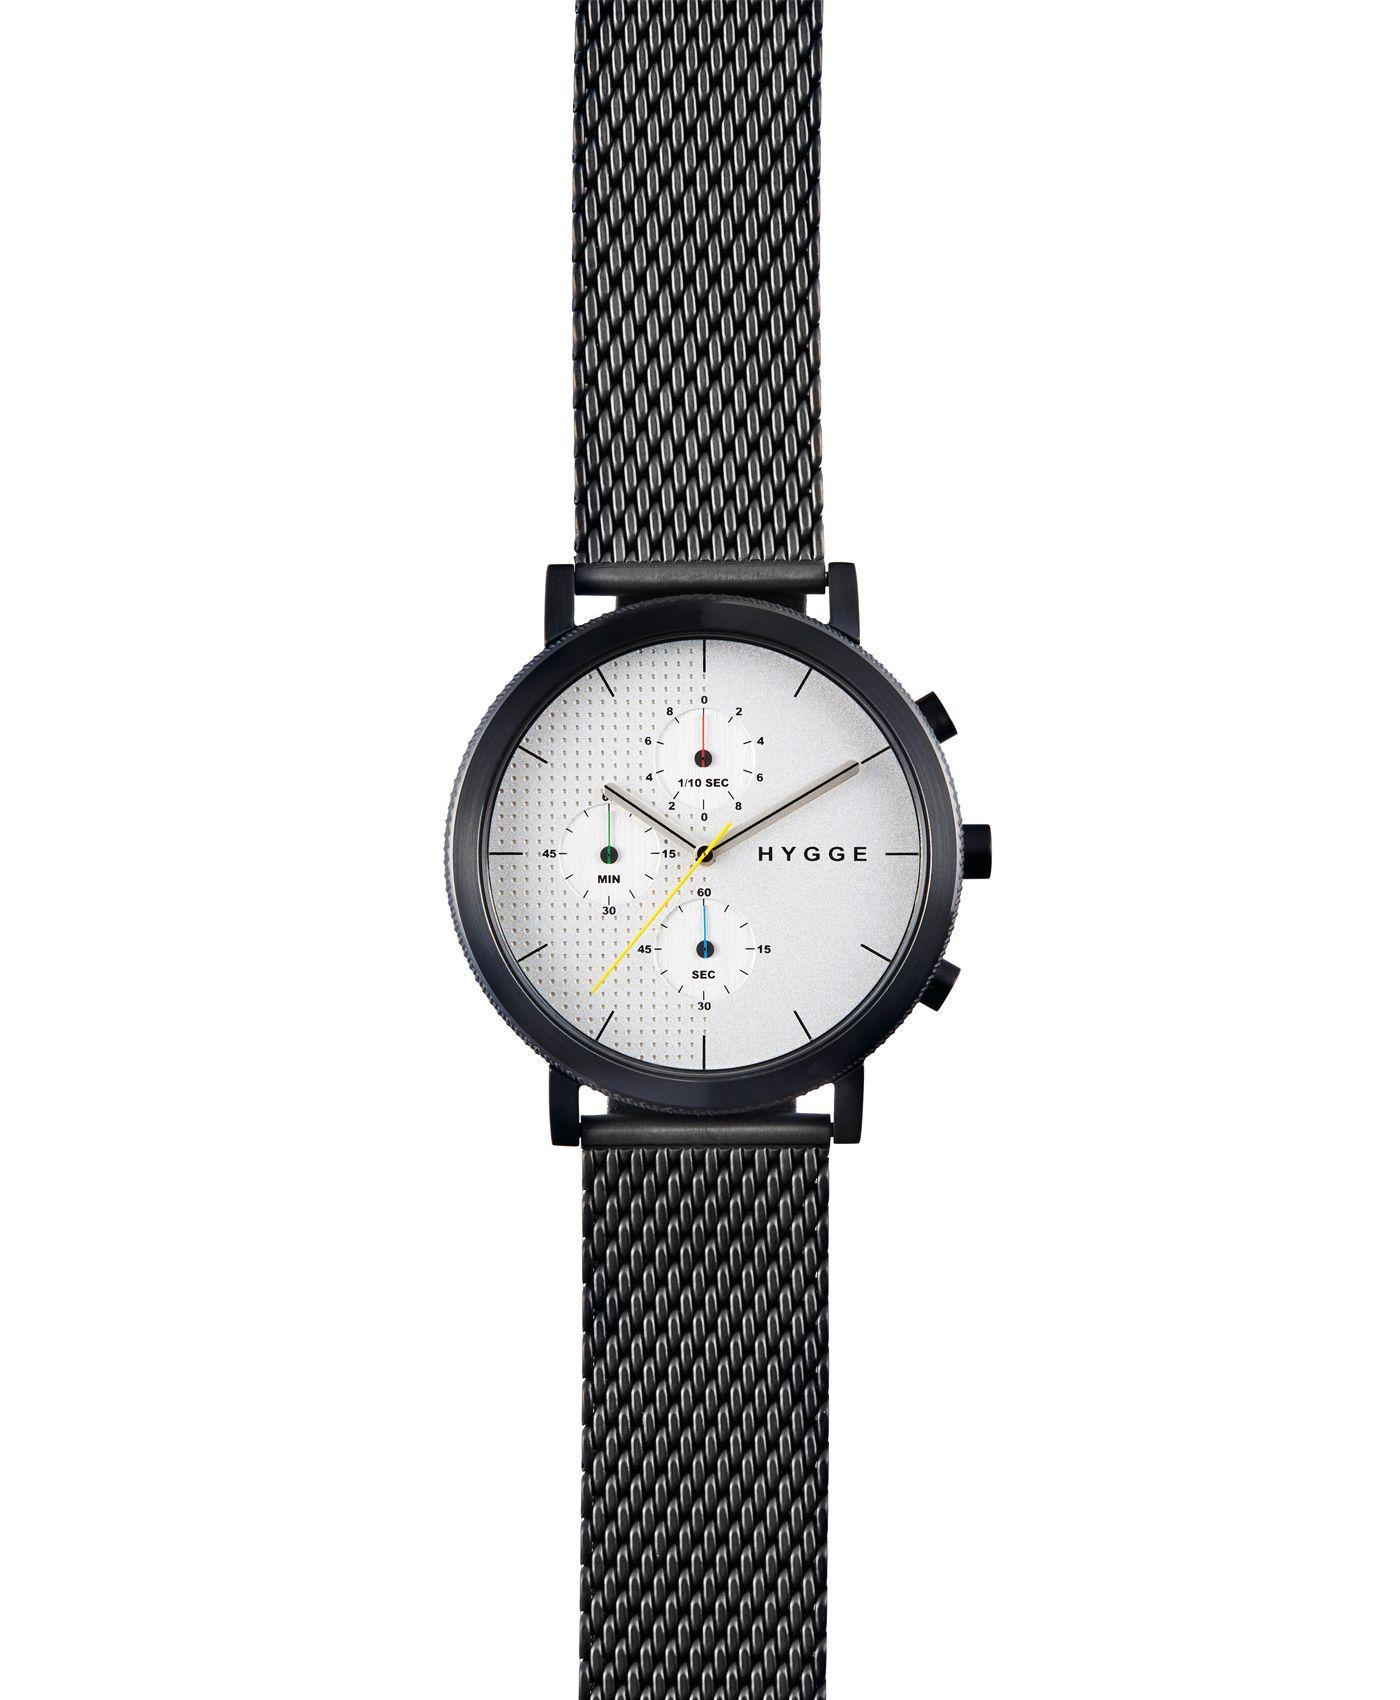 b944f2ddf5cb6 Hygge 2204 Chronograph MSM2204BC(CH) Uhr   Unsere Uhren   Hygge ...